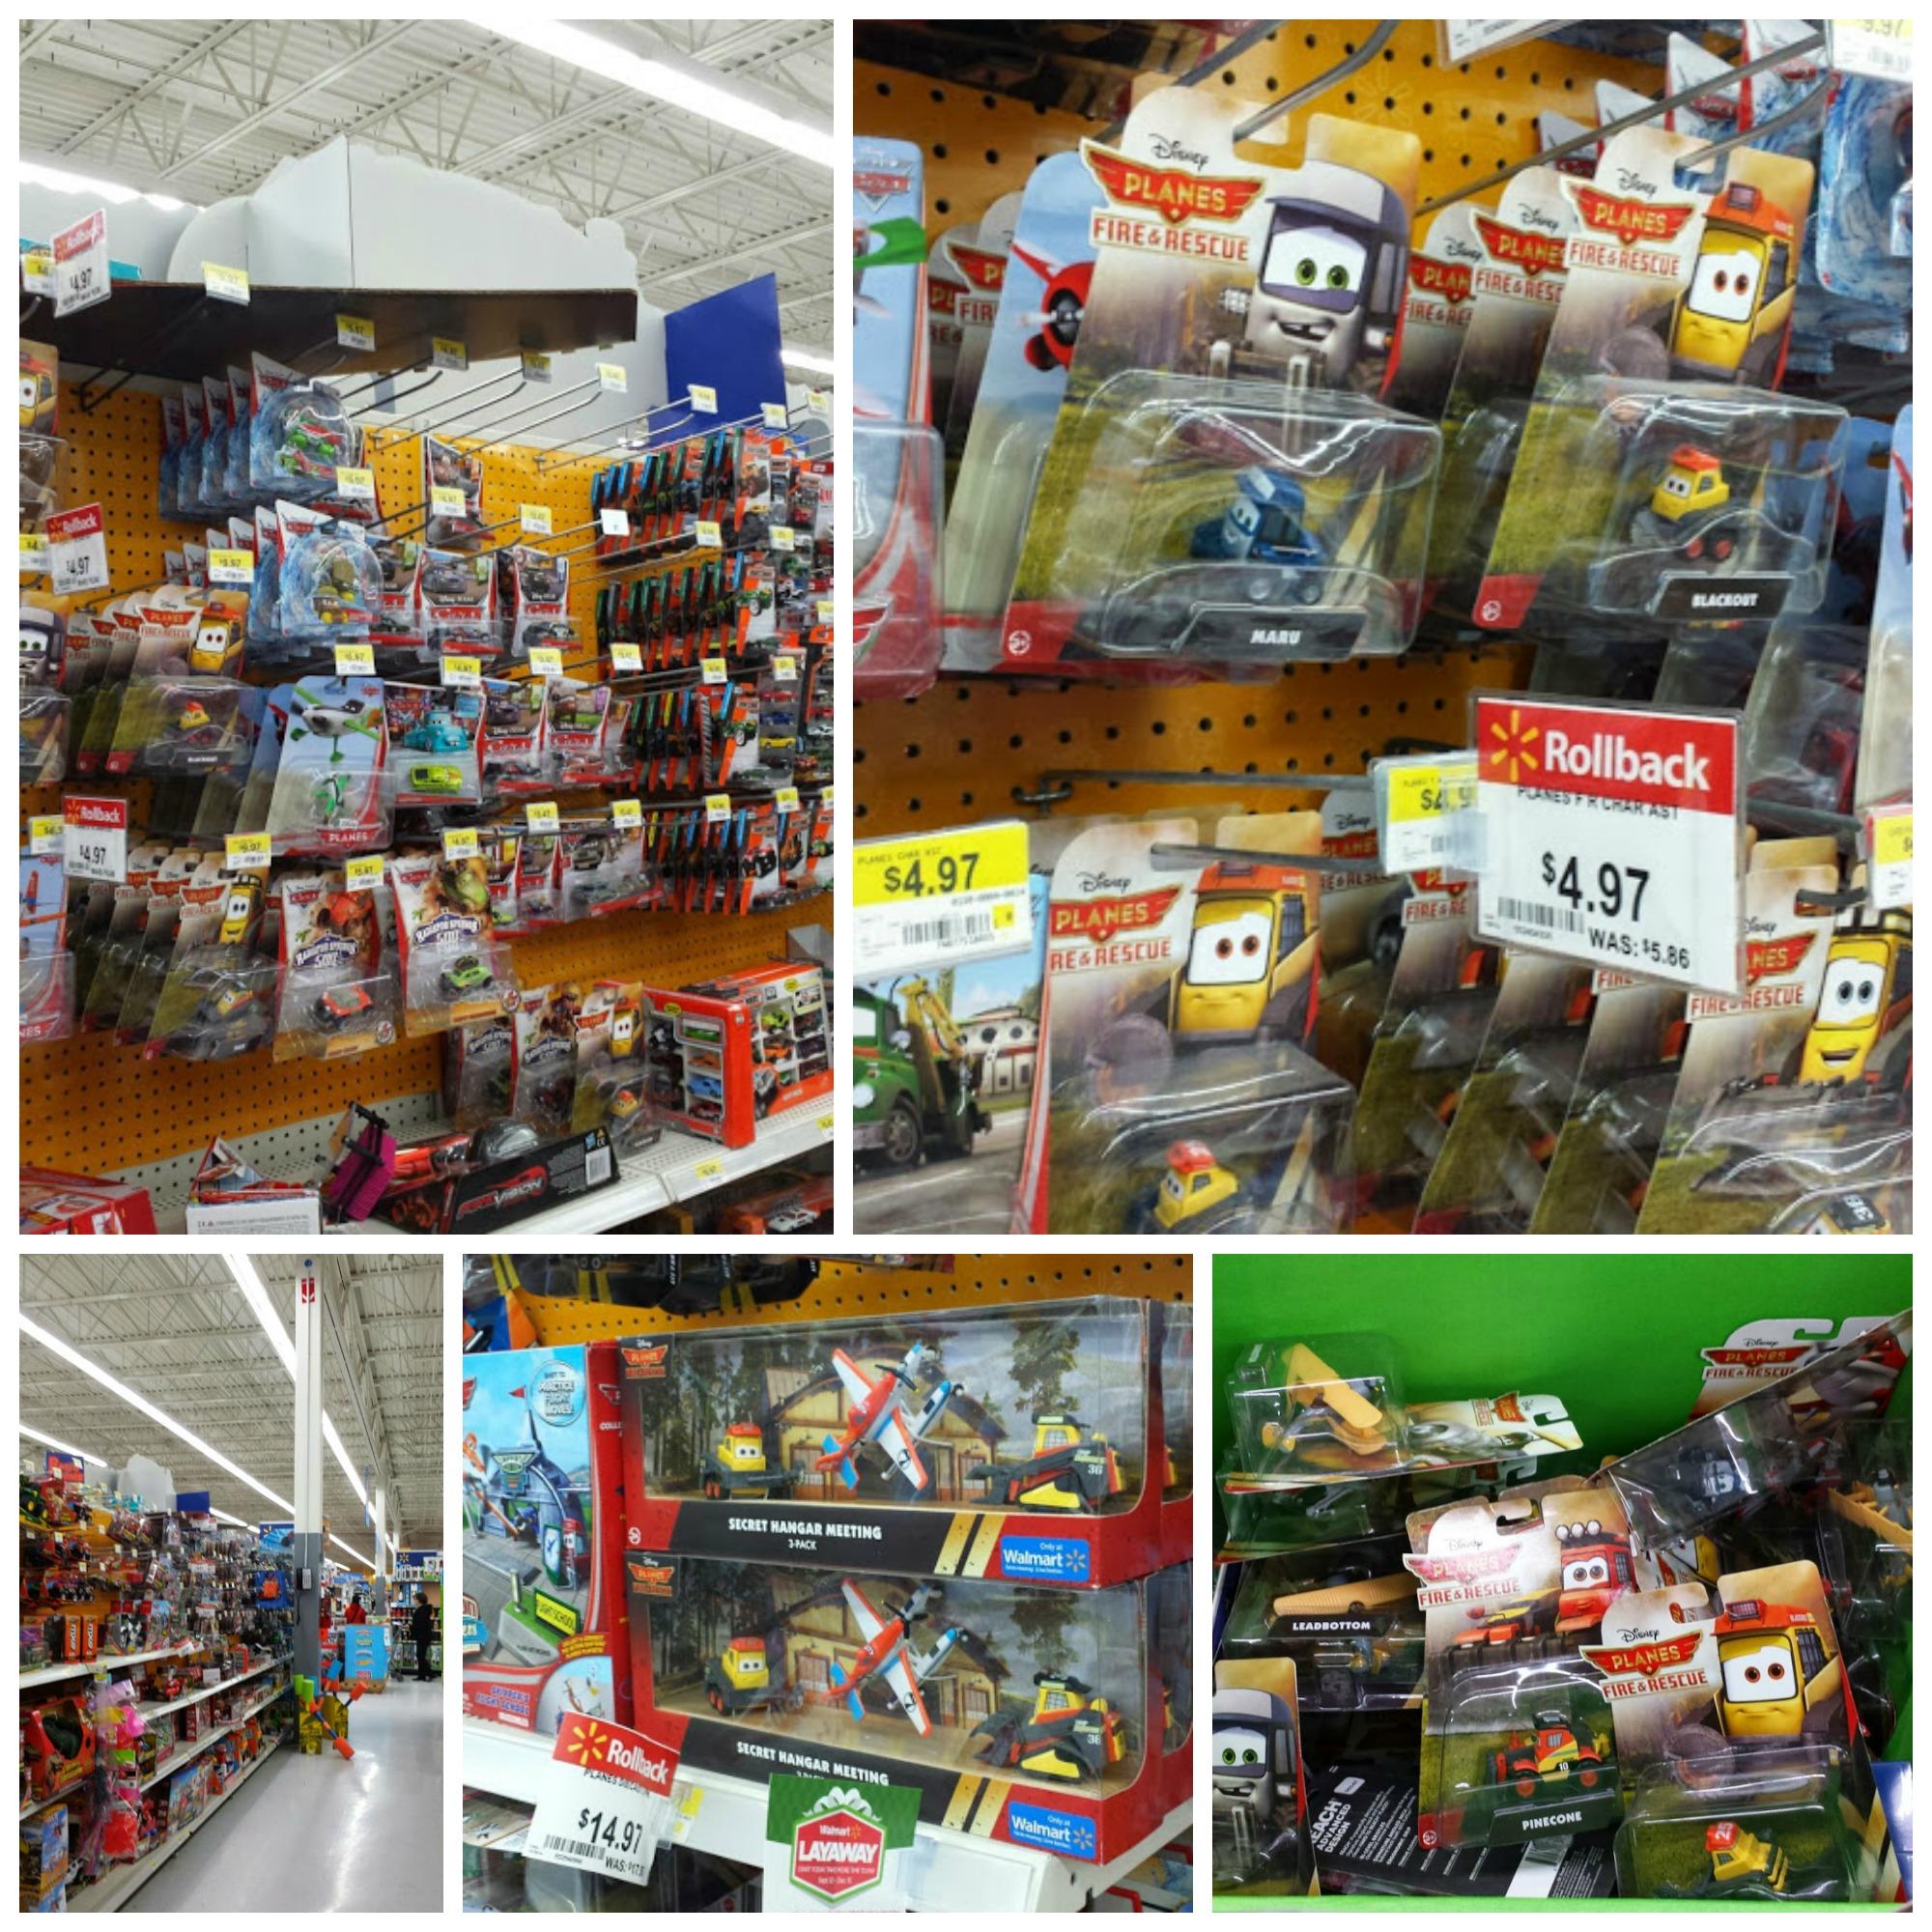 Walmart Toys For Christmas : Disney planes themed christmas tree planestotherescue